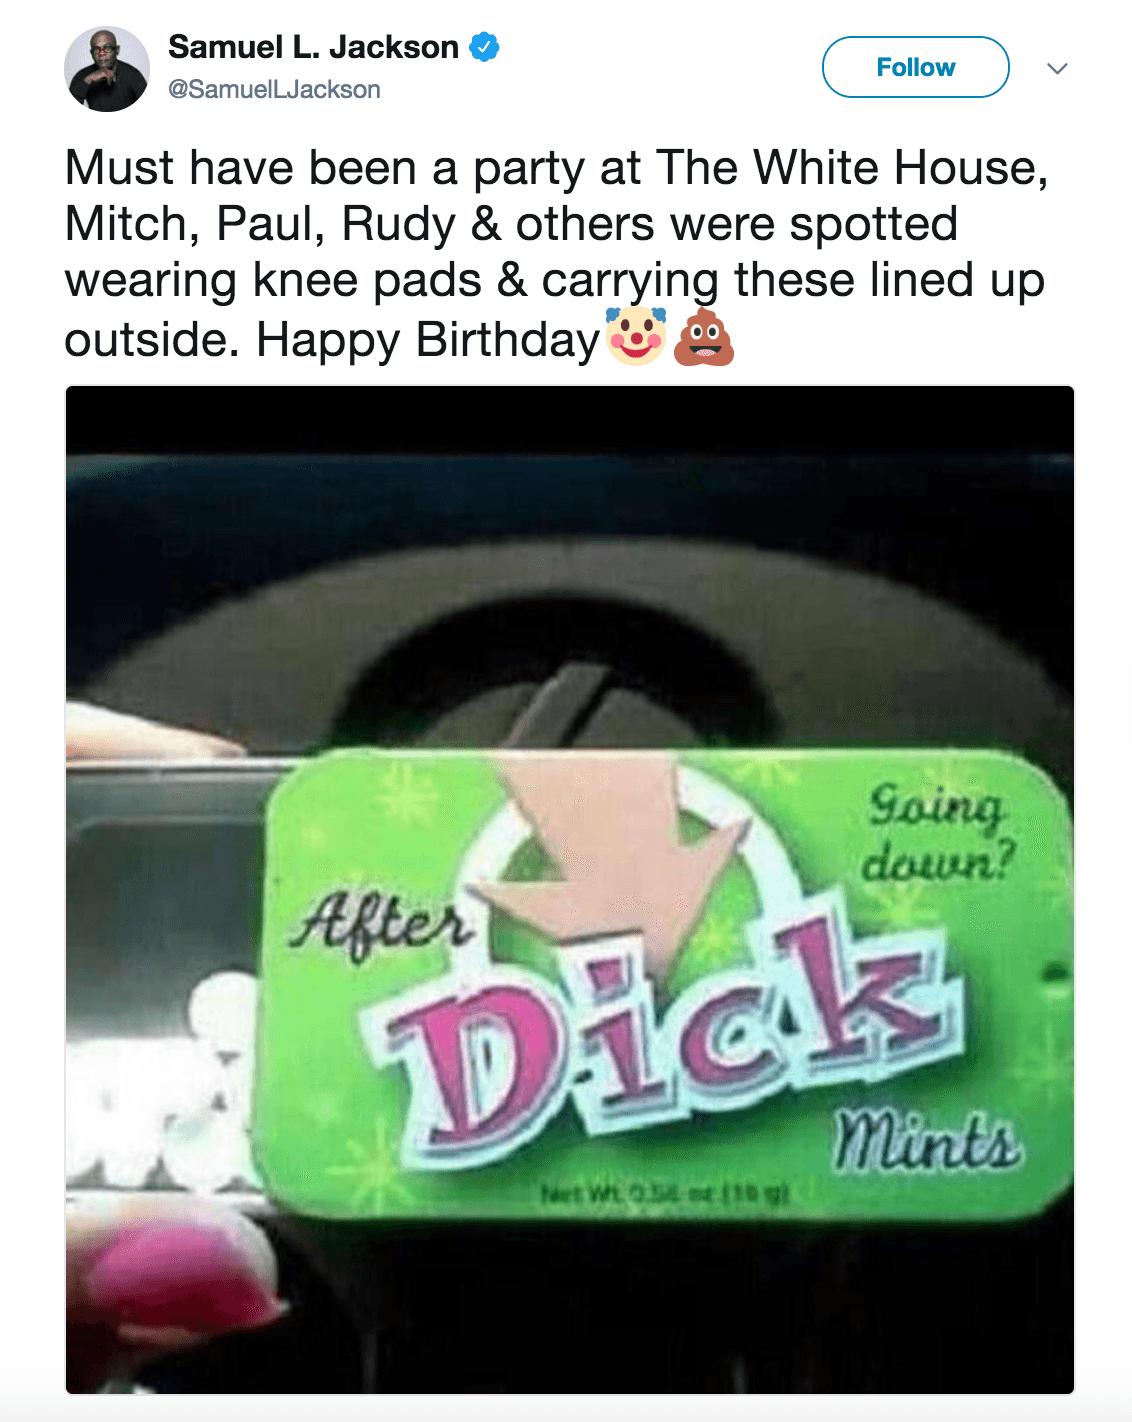 Samuel L Jackson Birthday tweet